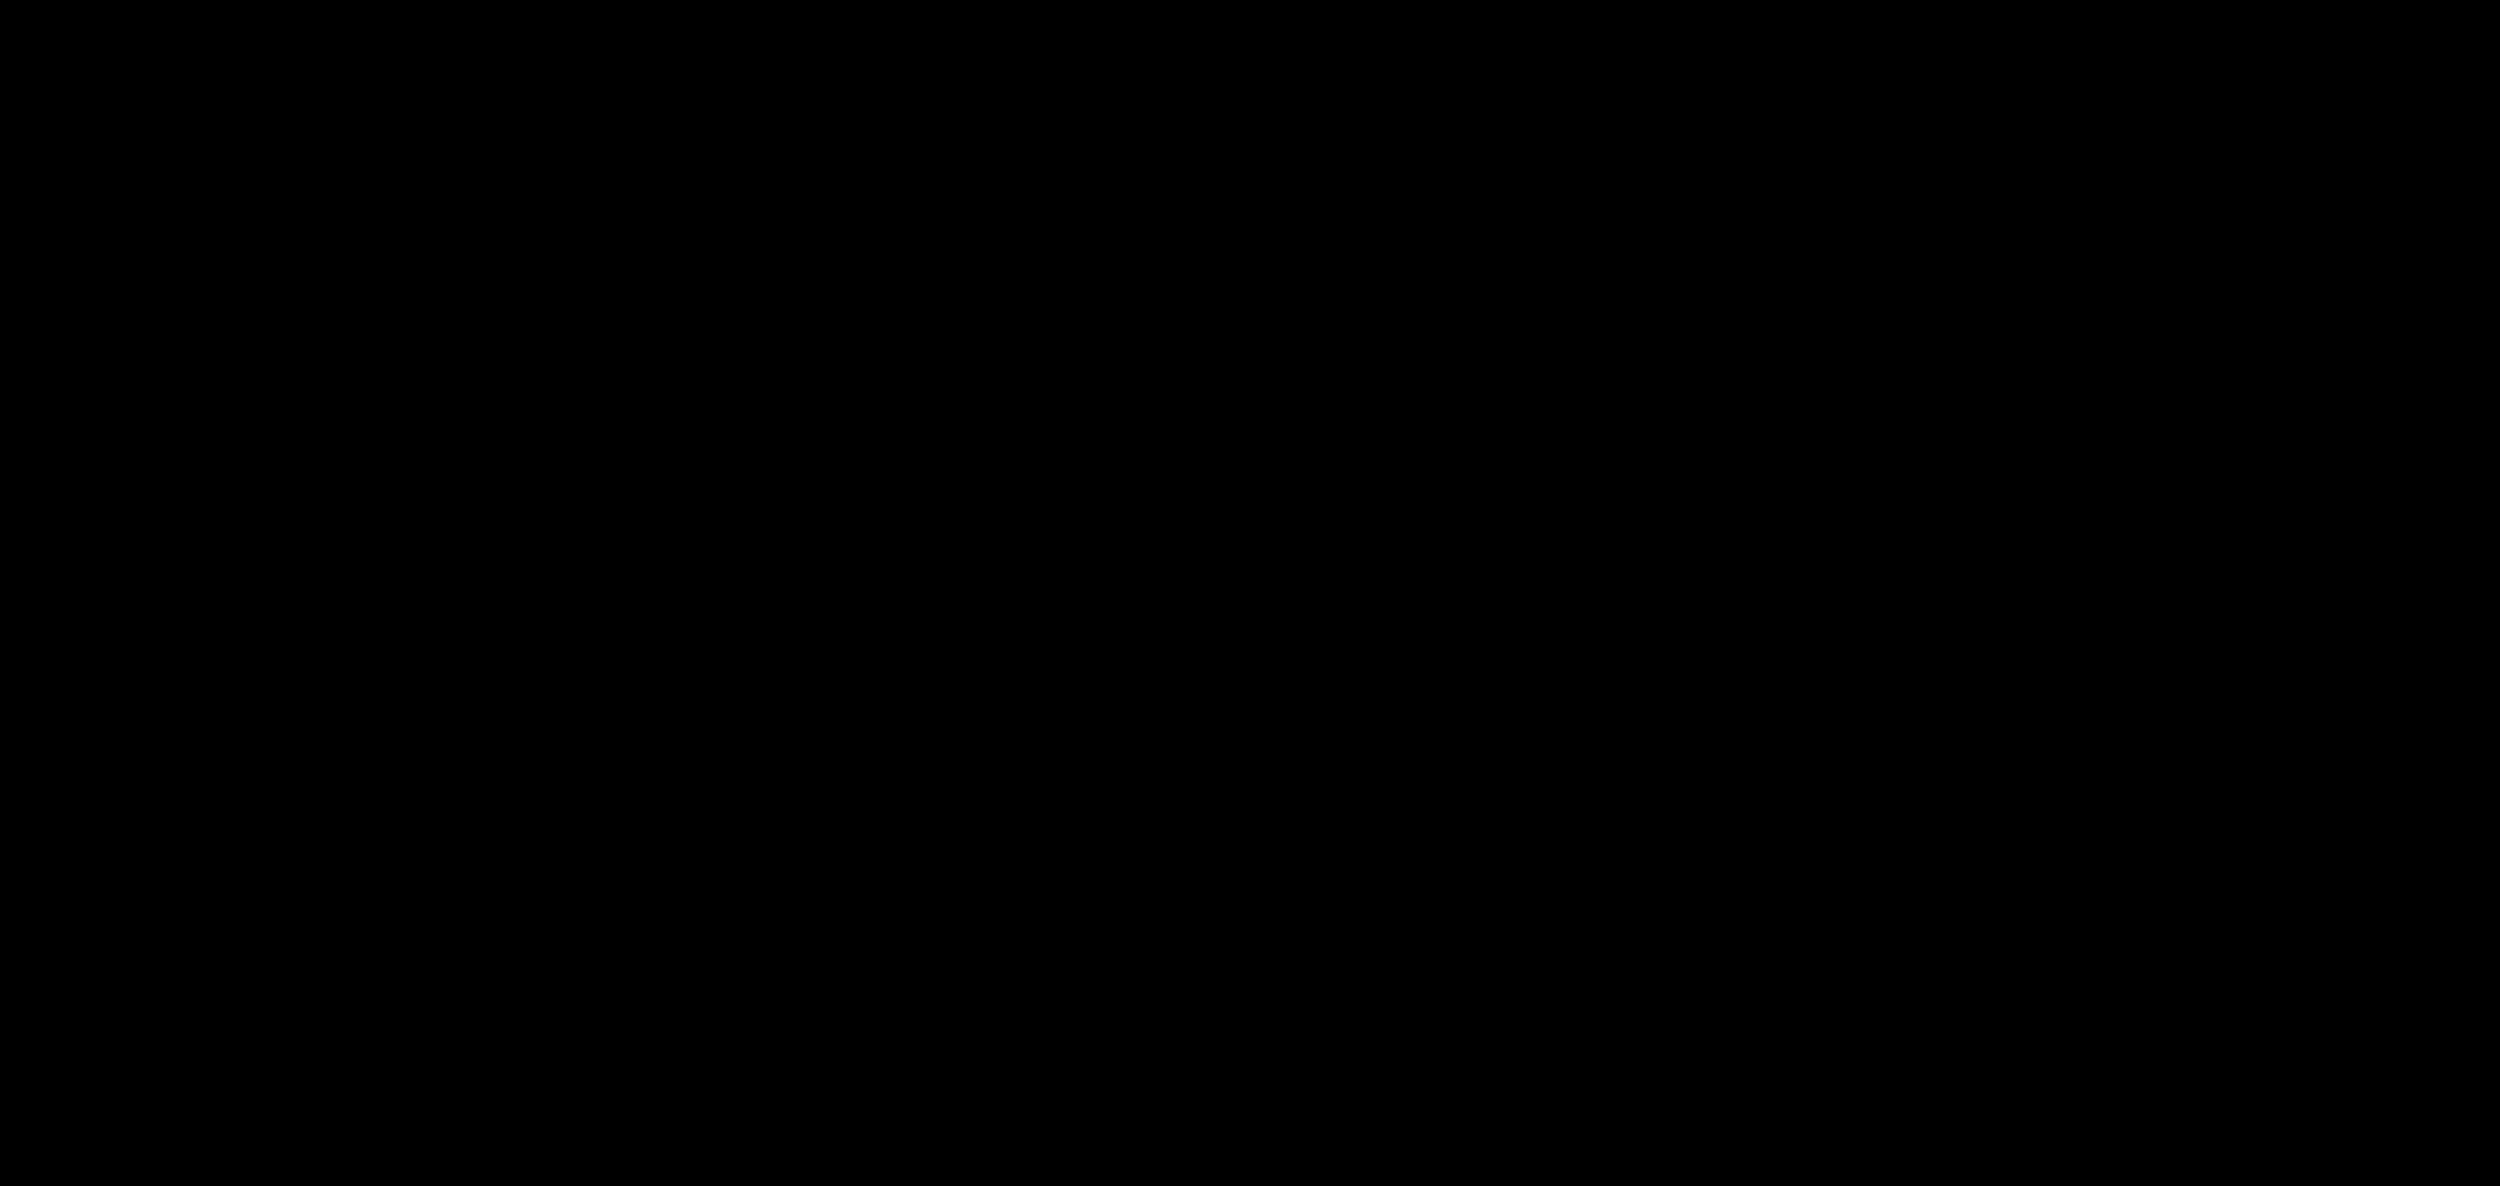 SLKC01-Logo-05-Secondary-Grayscale-Black-Final.png